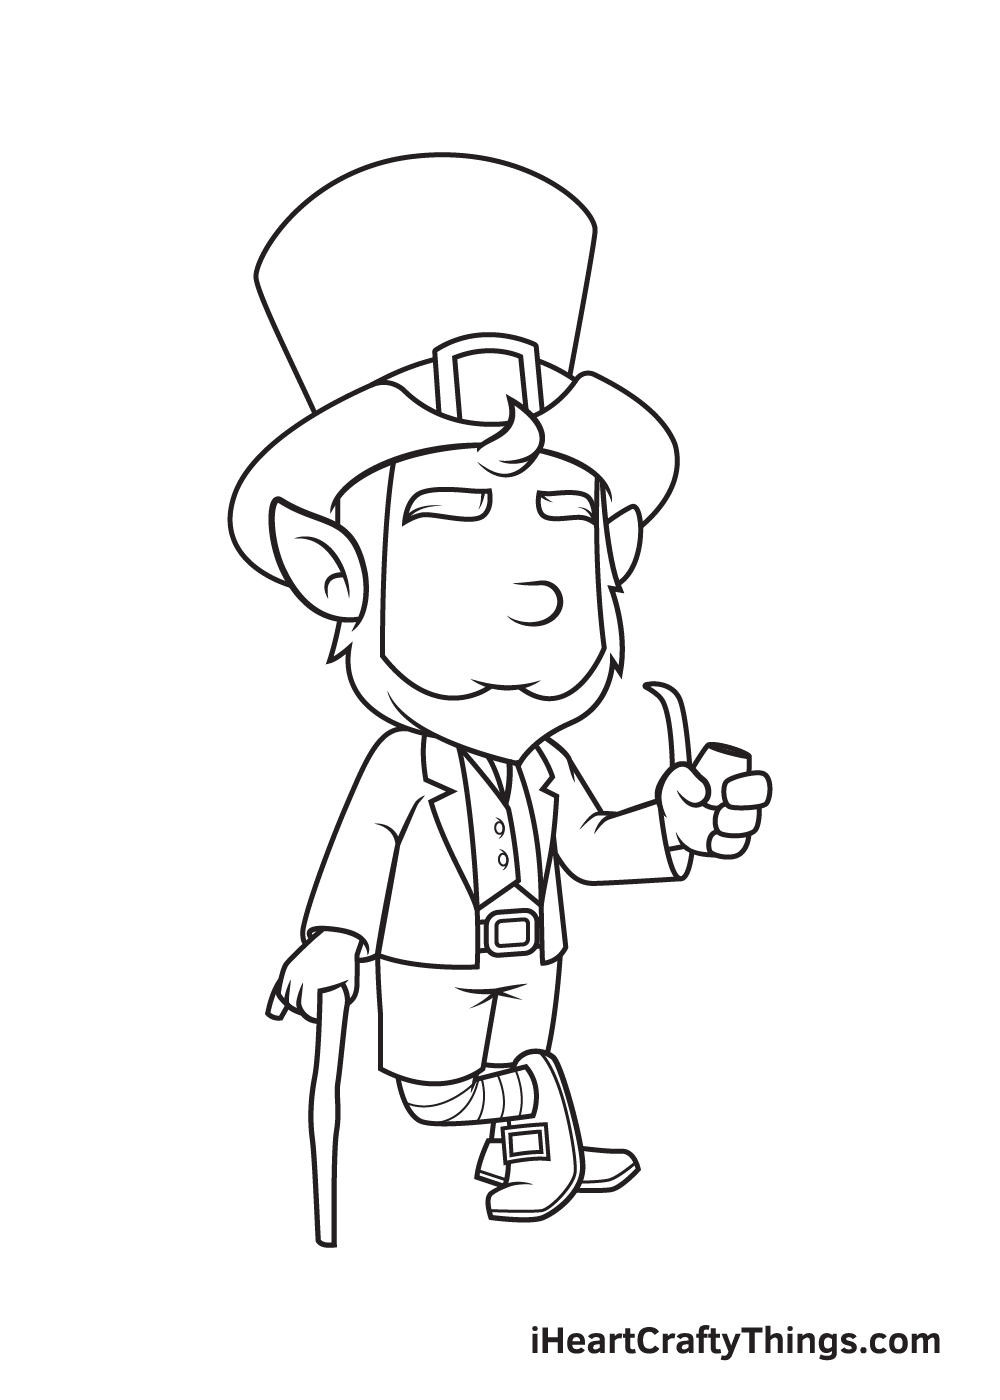 Leprechaun Drawing – Step 7